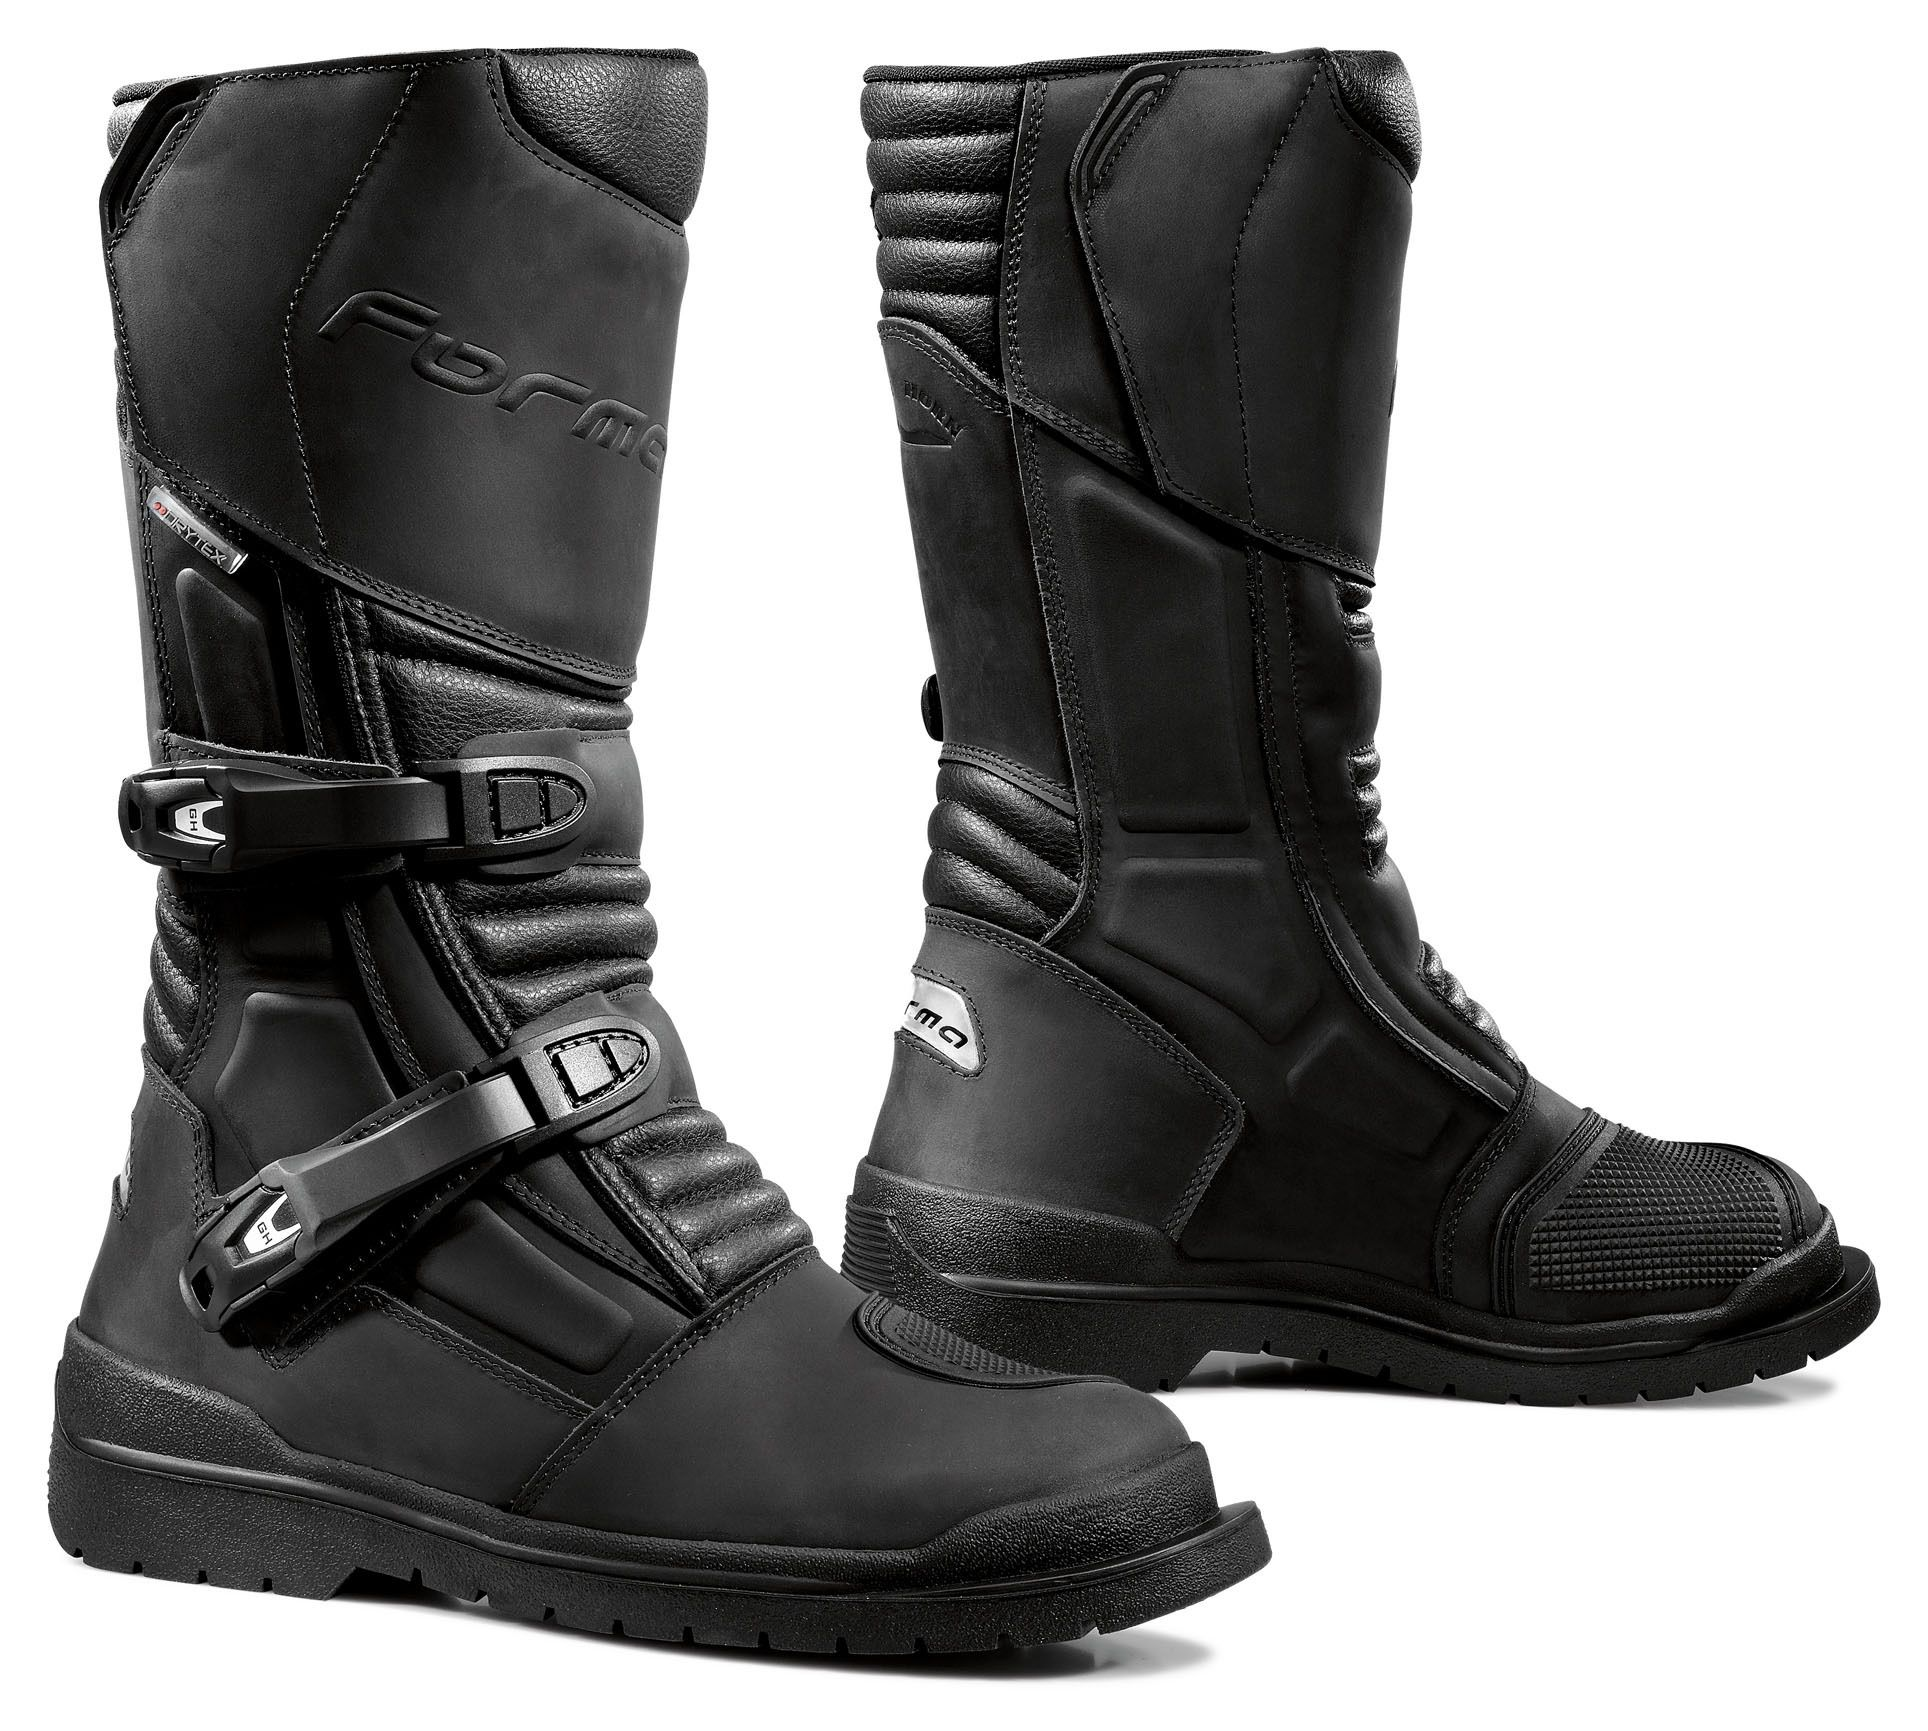 forma_cape_horn_boots.jpg